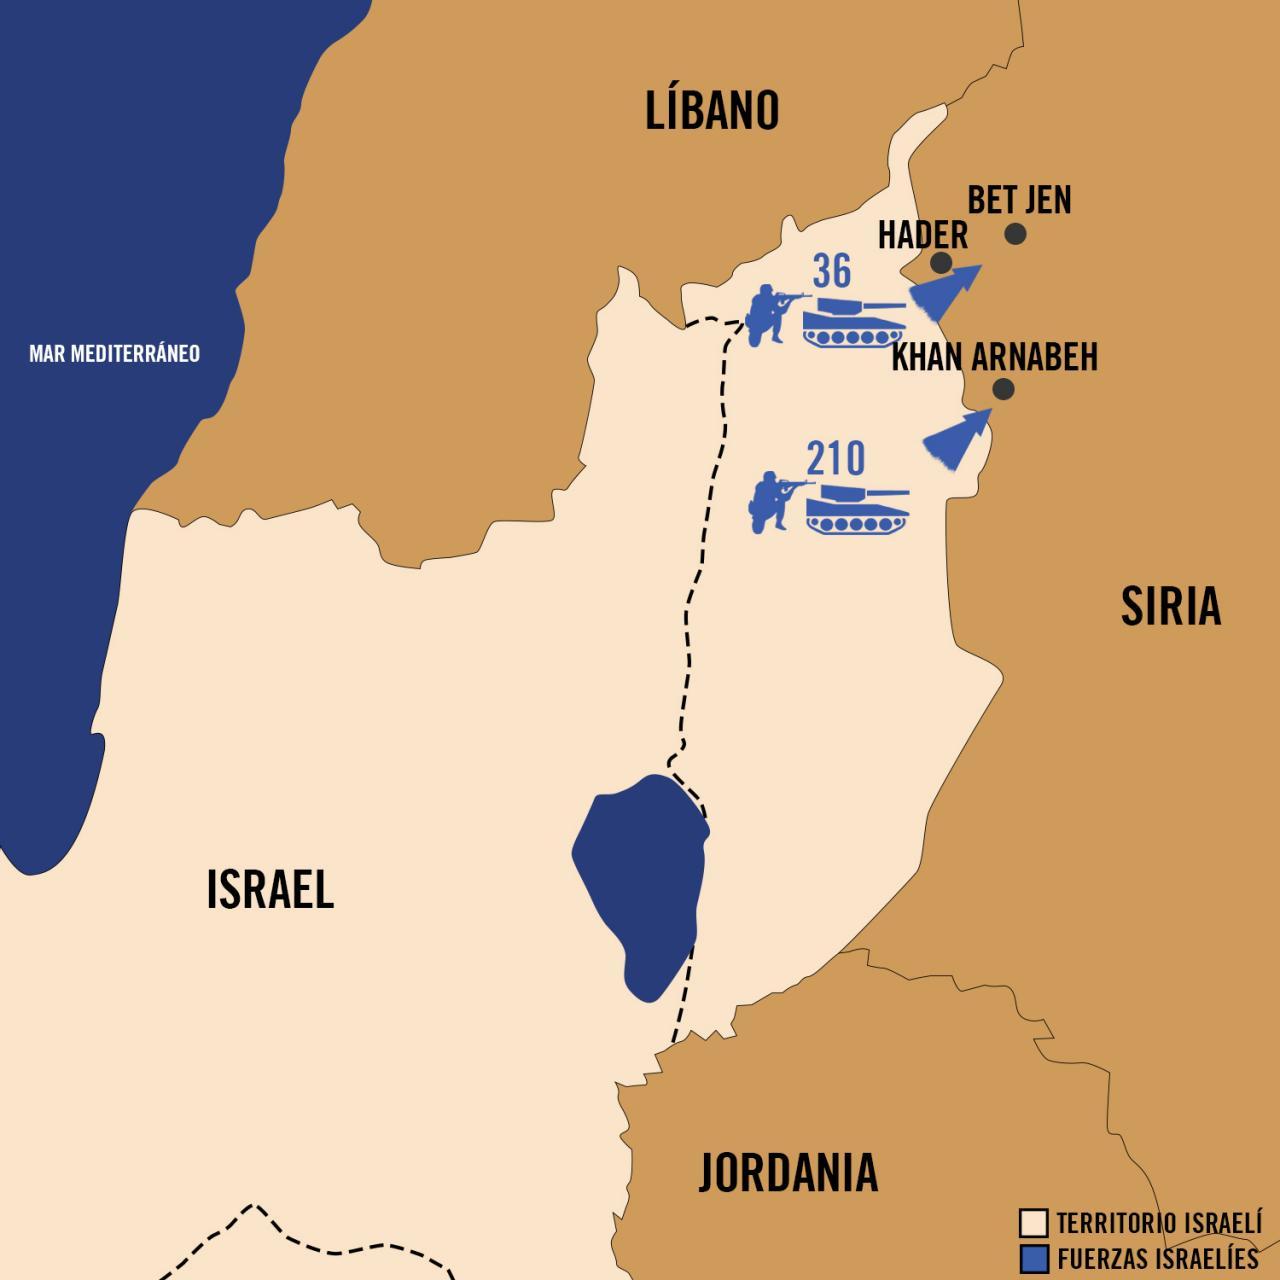 Mapa Yom Kipur - Fuerzas de Defensa de Israel